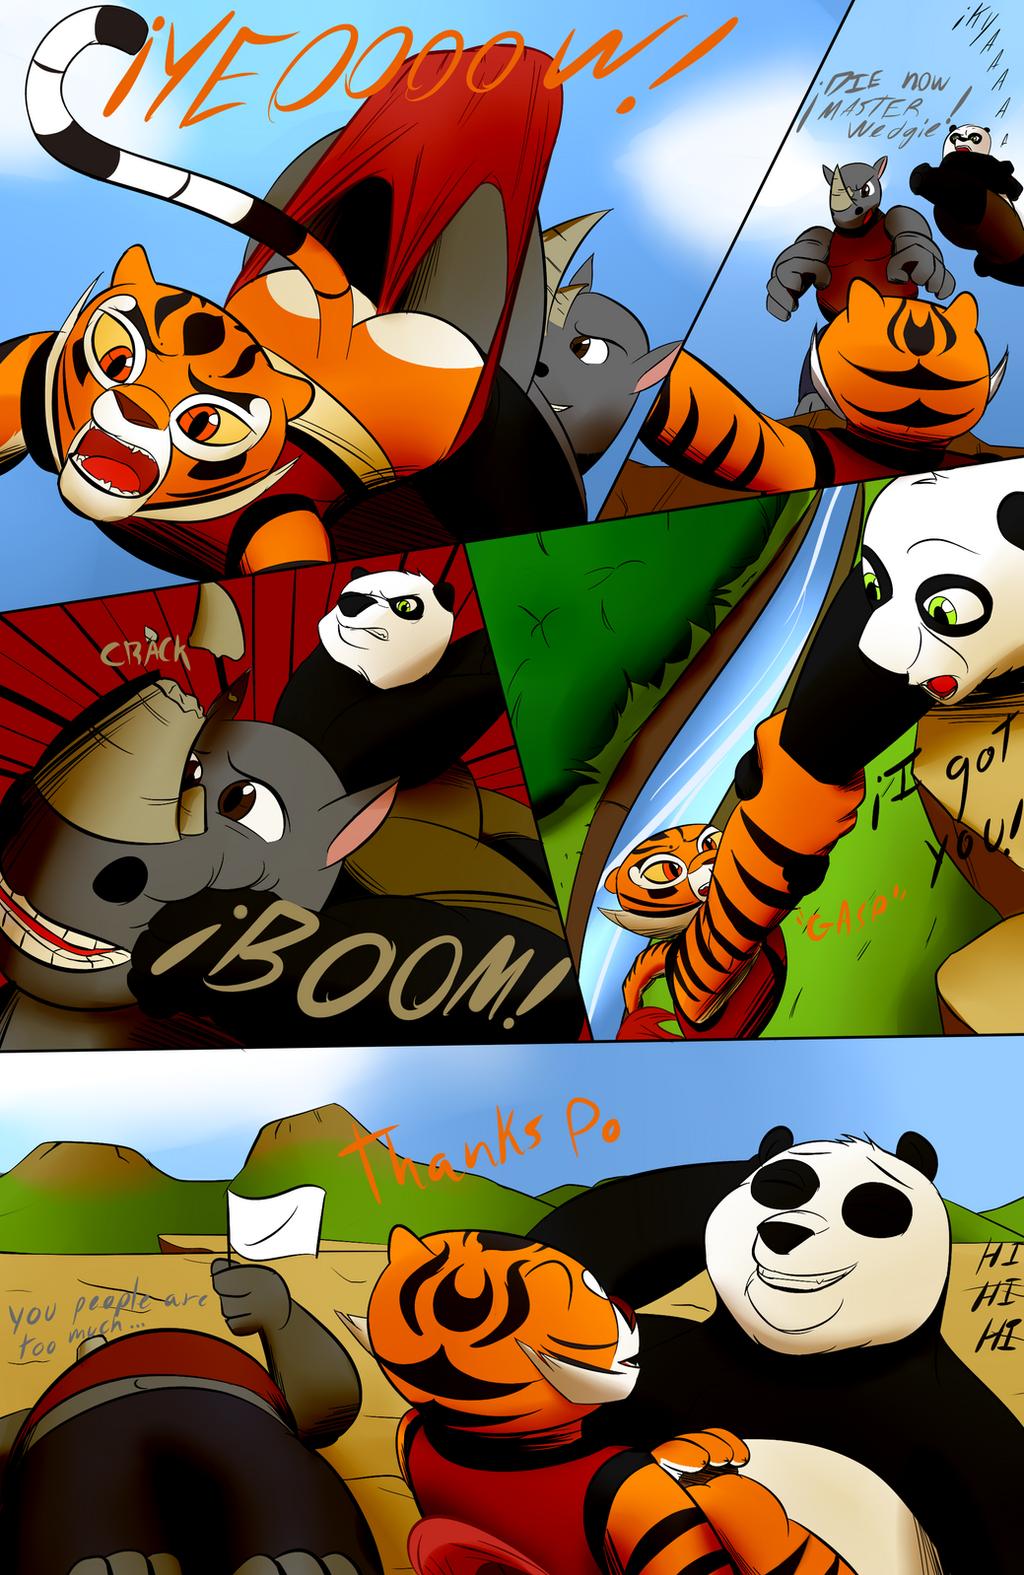 кунг фу панда порно комикс или фото